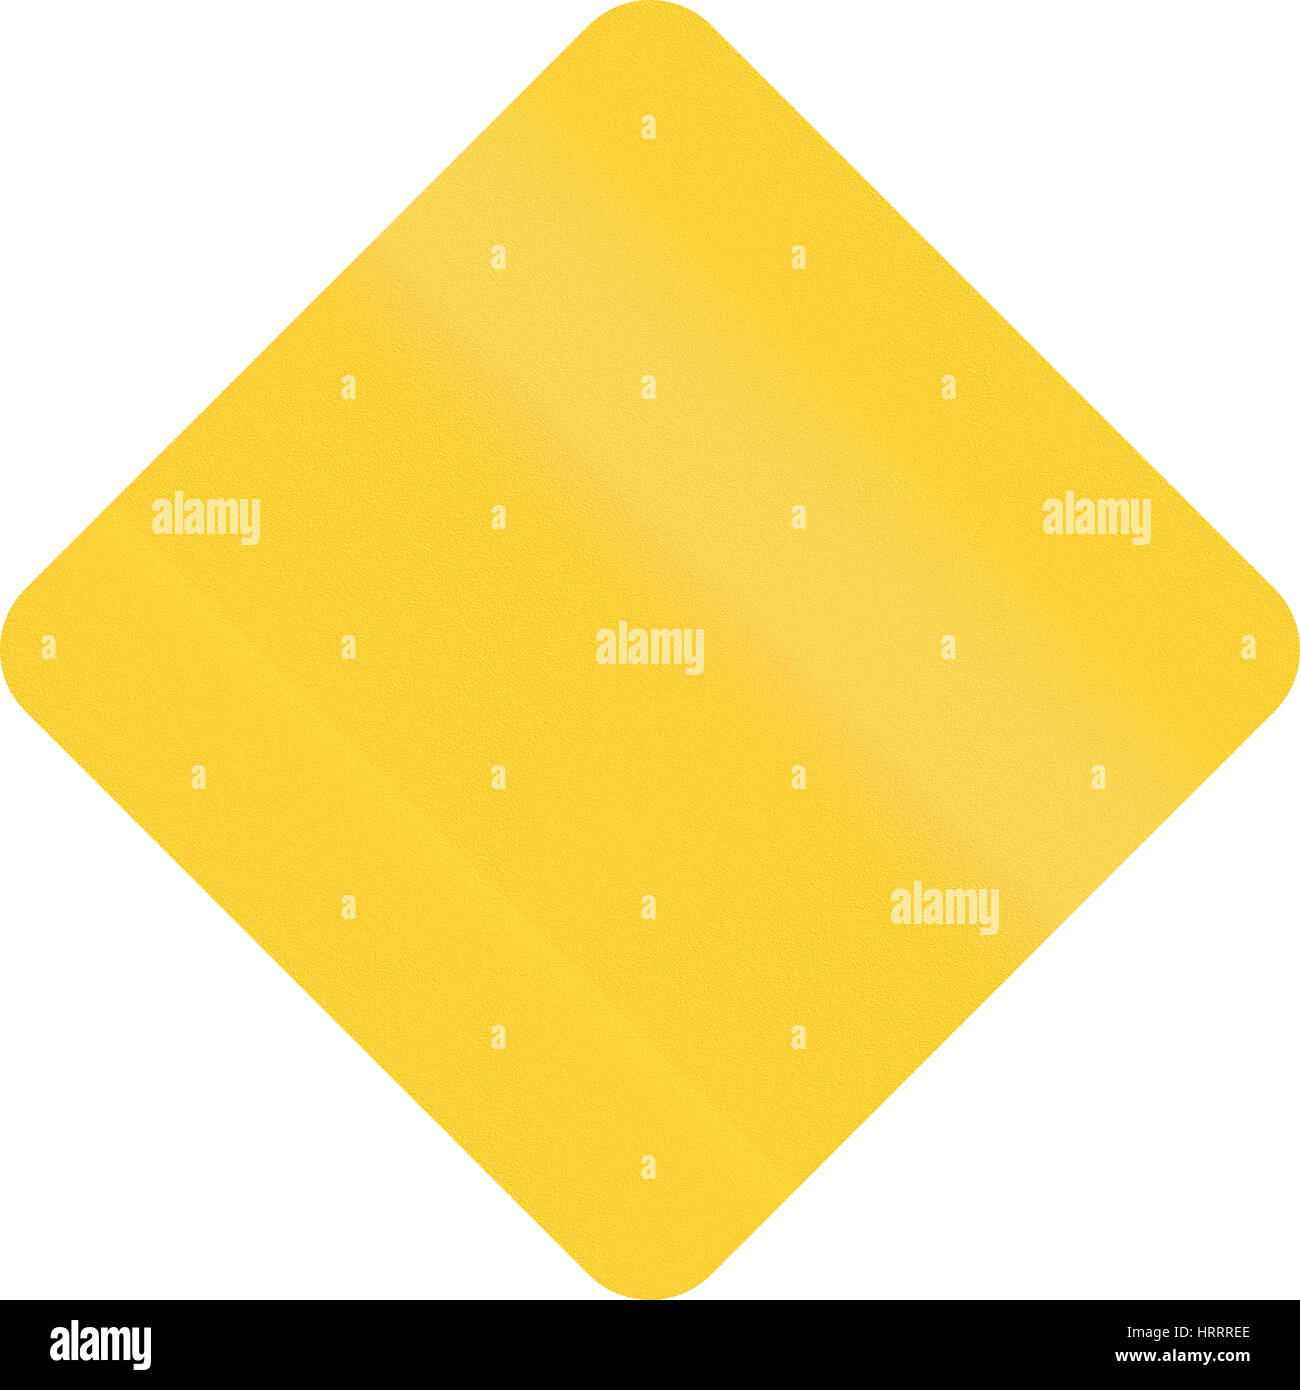 united mutcd diamond shape template stock photos united mutcd